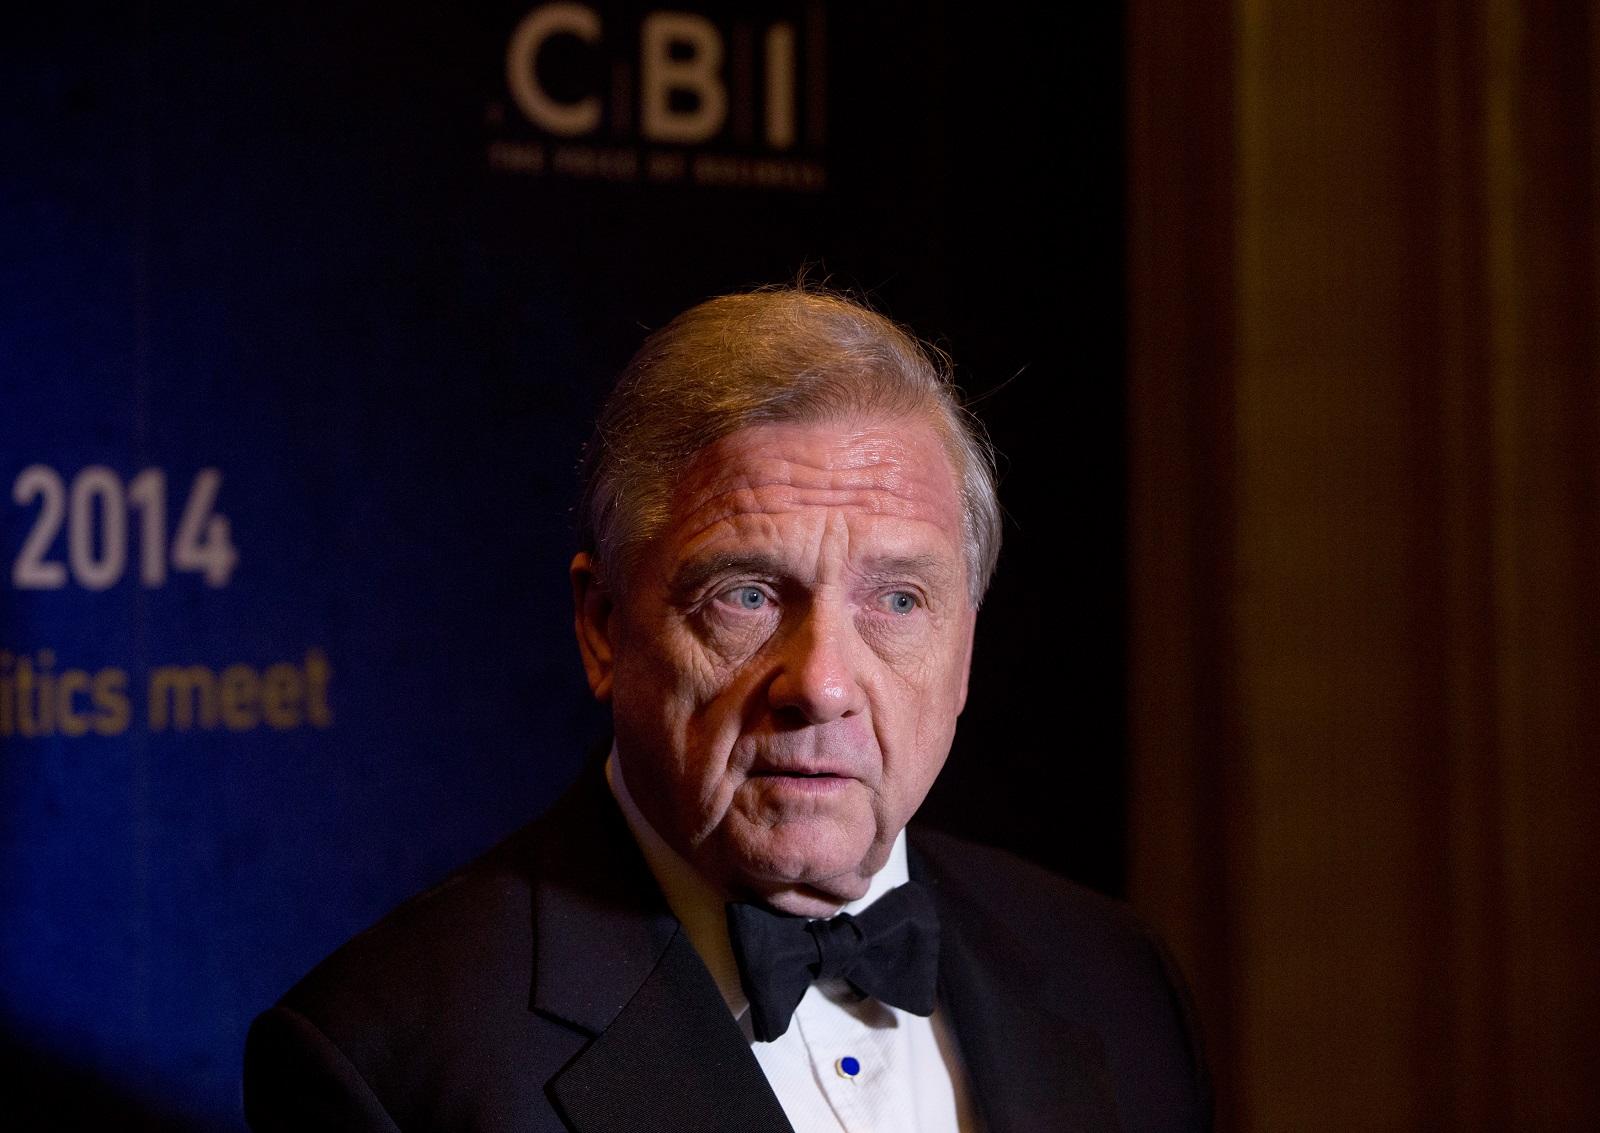 Sir Mike Rake of the CBI